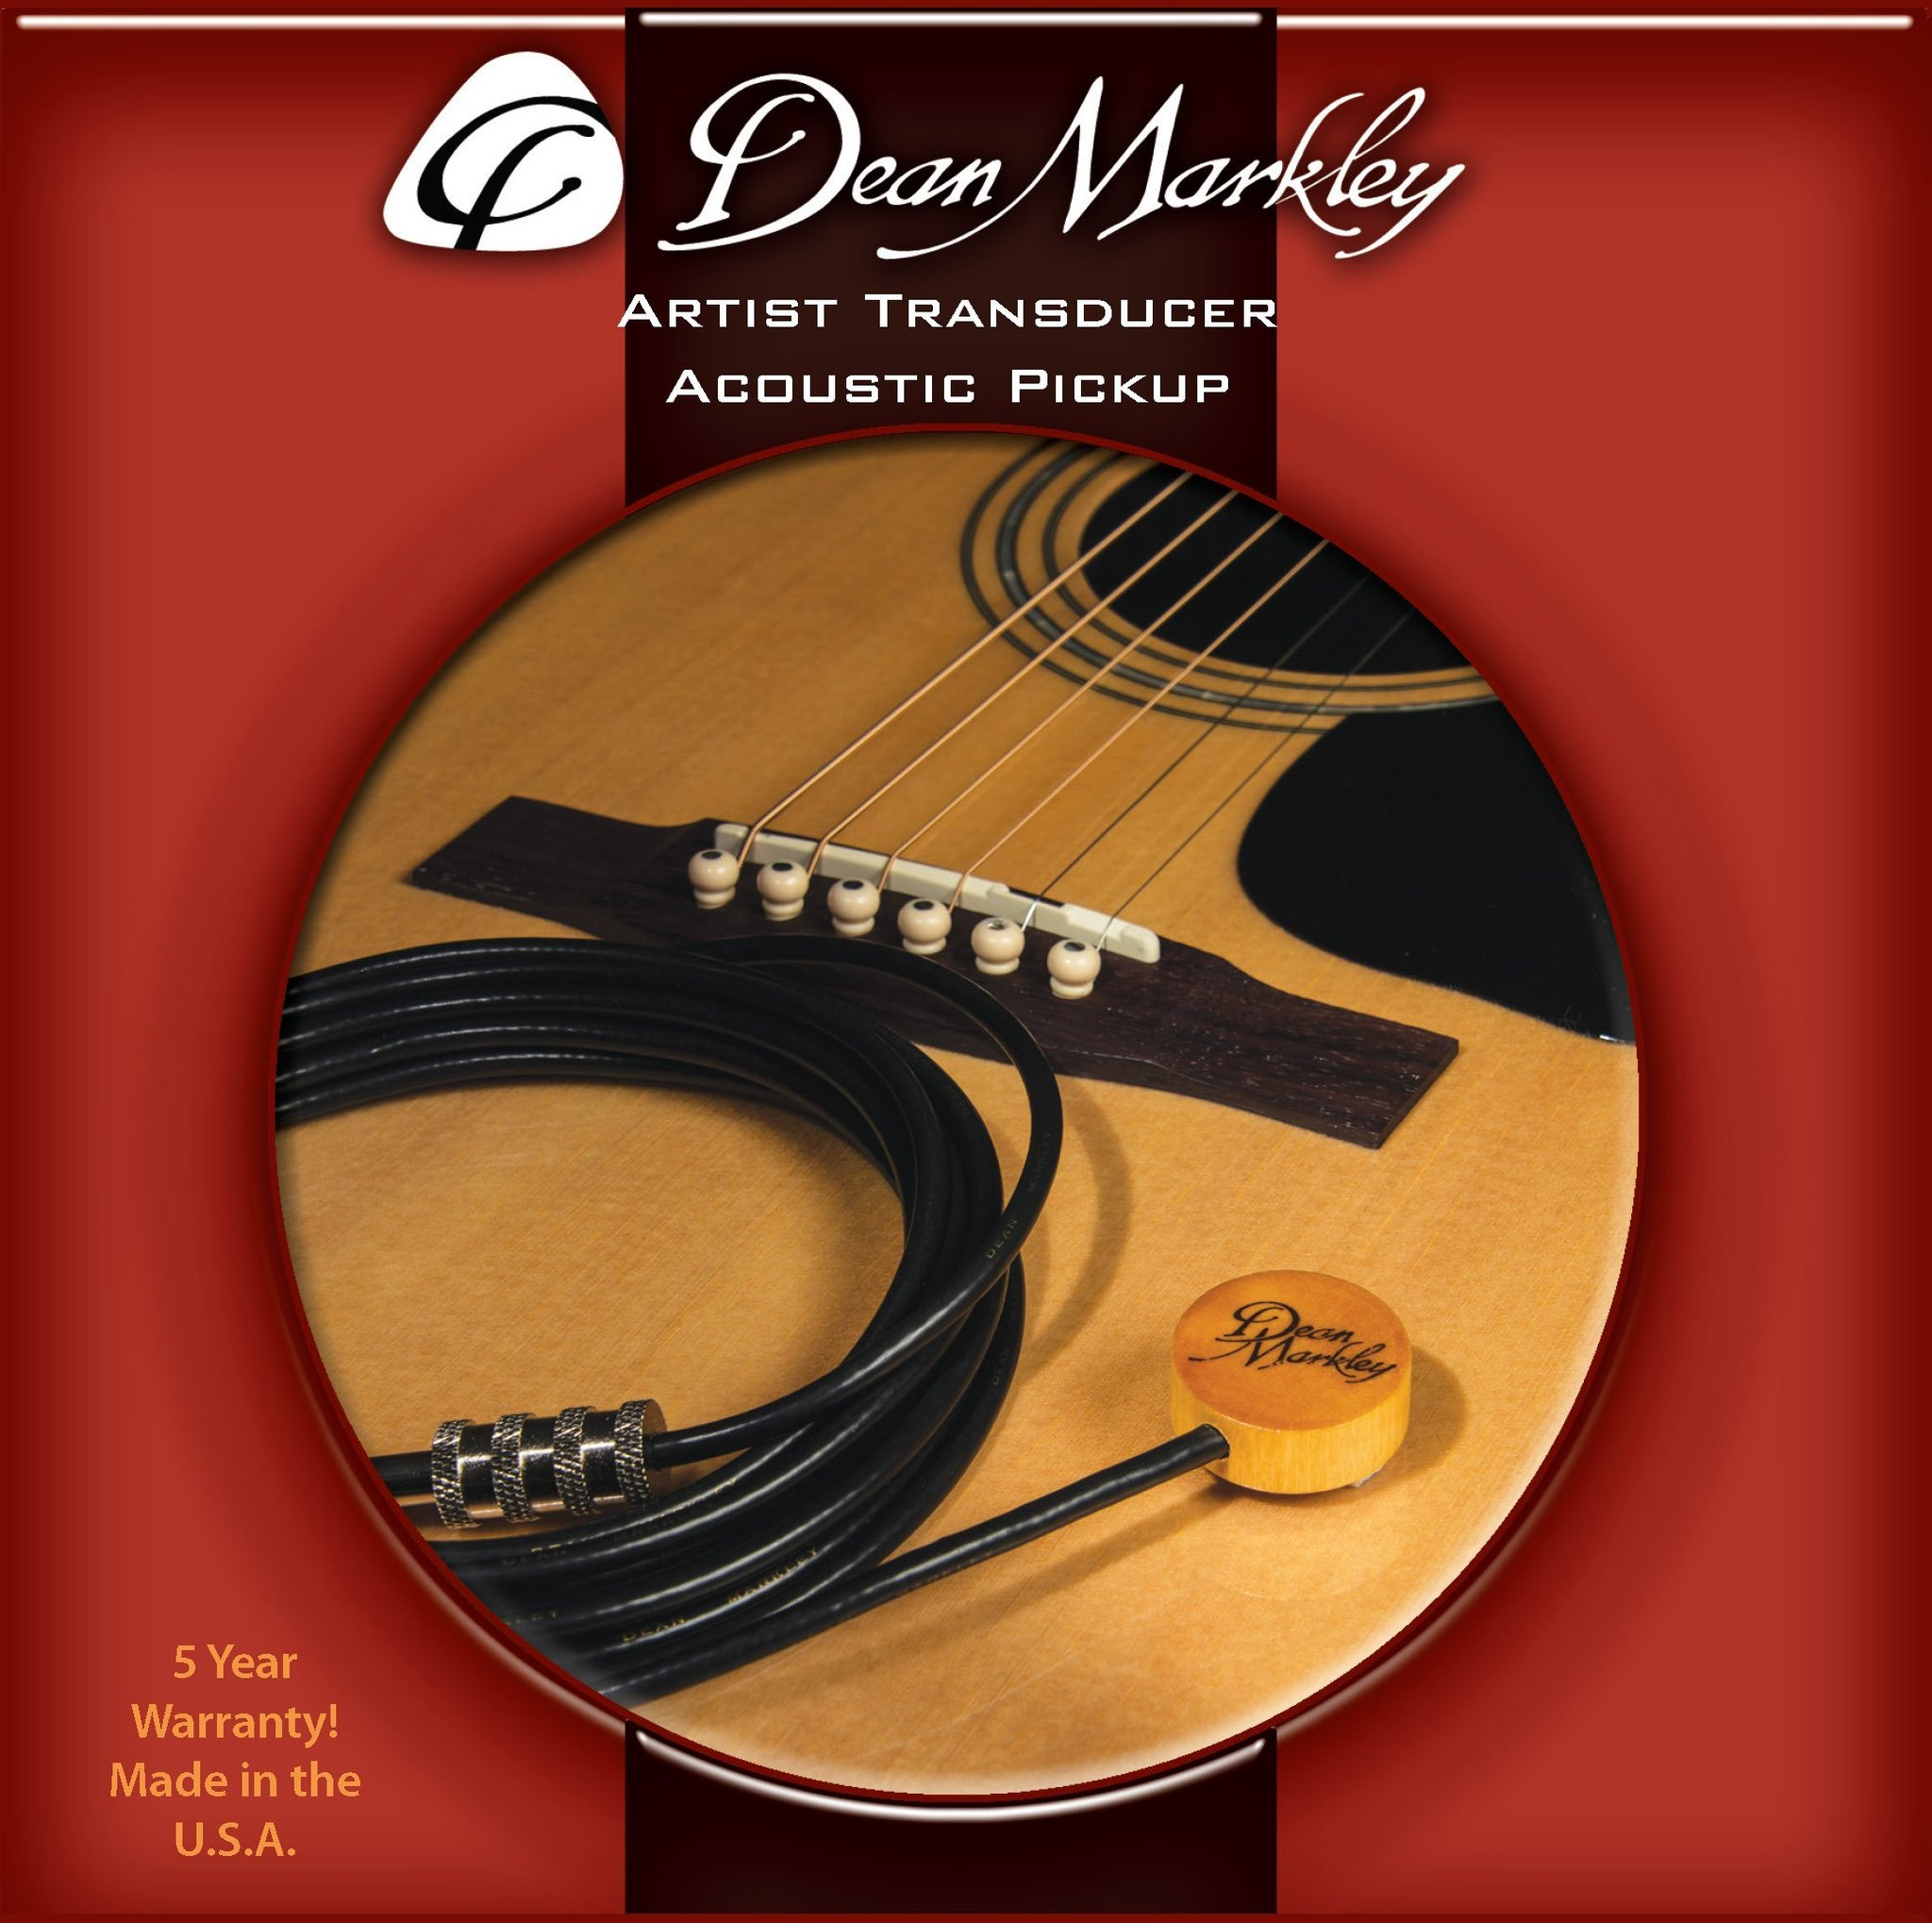 Dean Markley 3001 Artist XM Transducer Acoustic Pickup